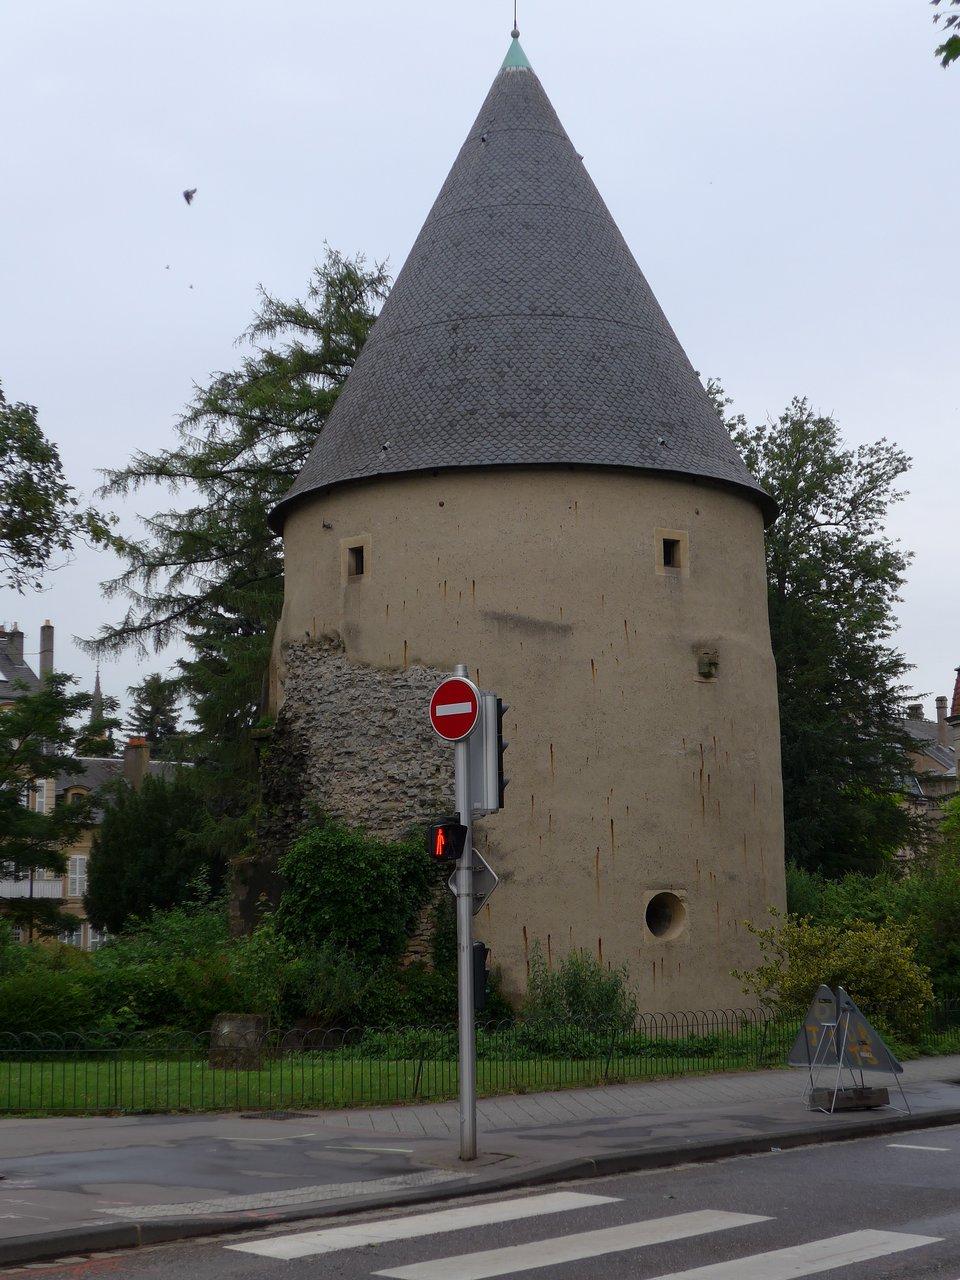 Tour Camoufle - Metz - Tour Camoufle Yorumları - Tripadvisor concernant Les Jardins Du Golf Metz